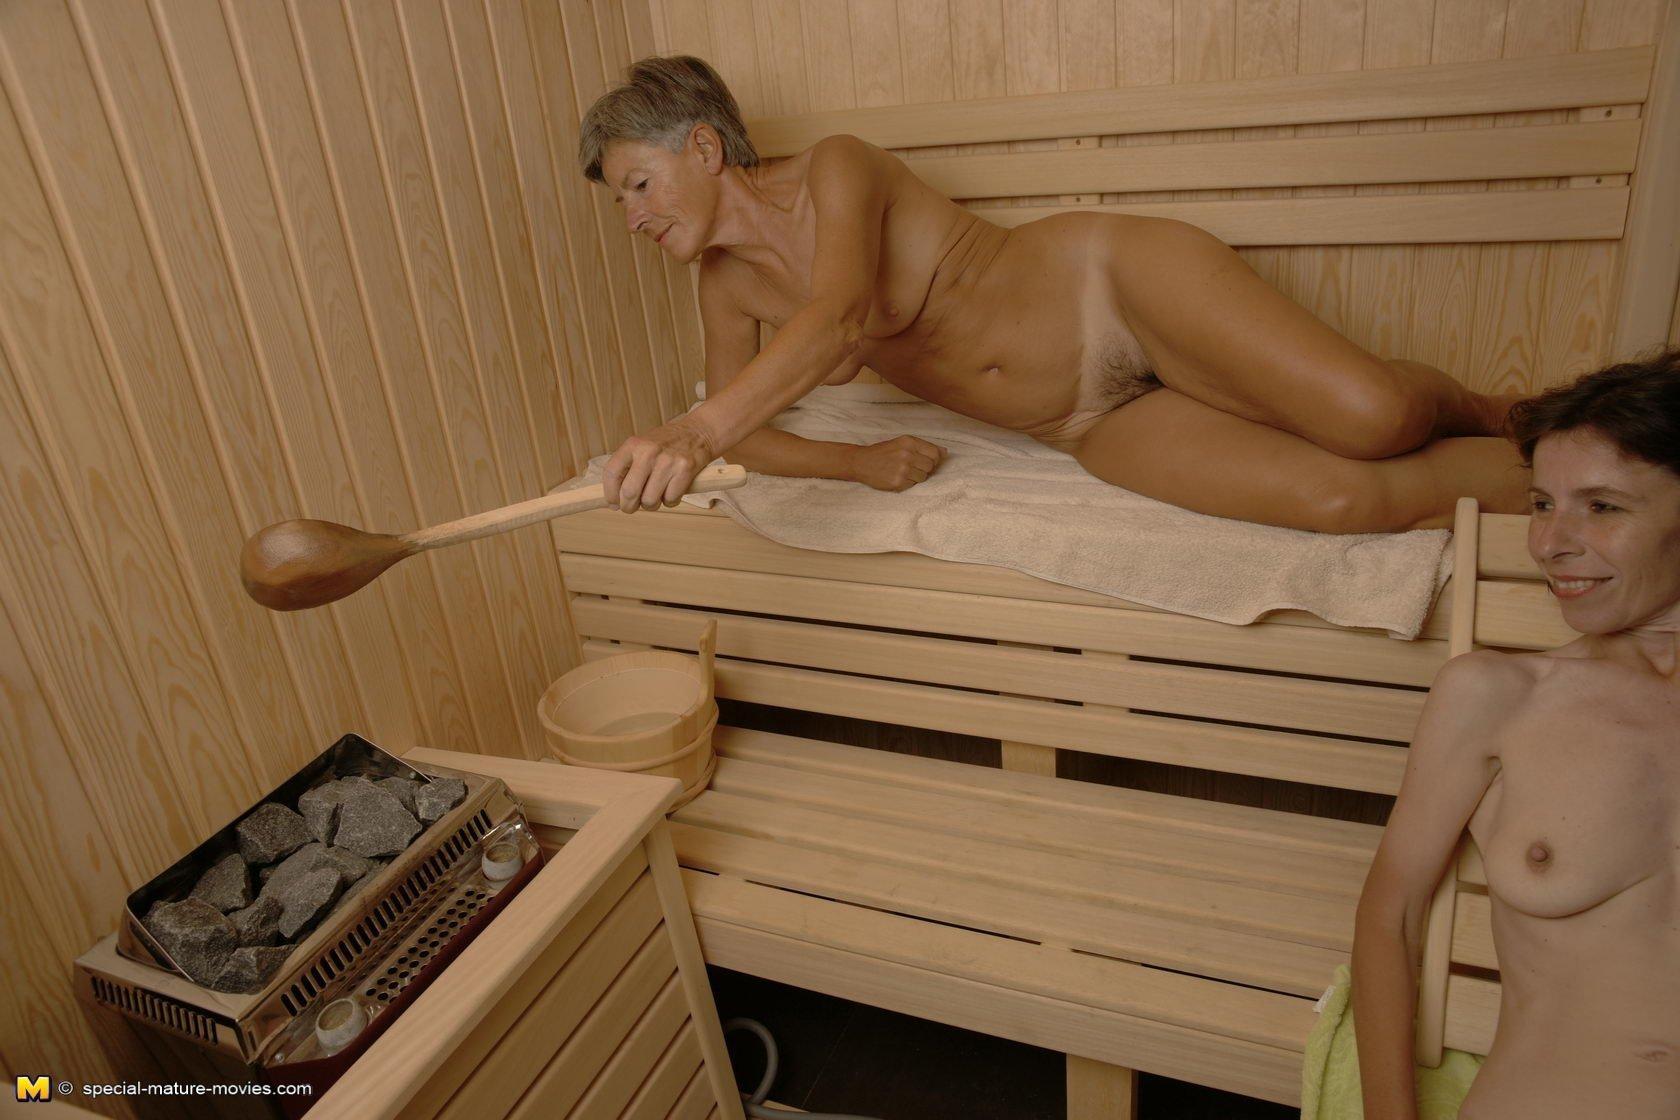 golie-zrelie-zhenshini-v-saune-video-vozbuzhdayushie-sochnie-popki-foto